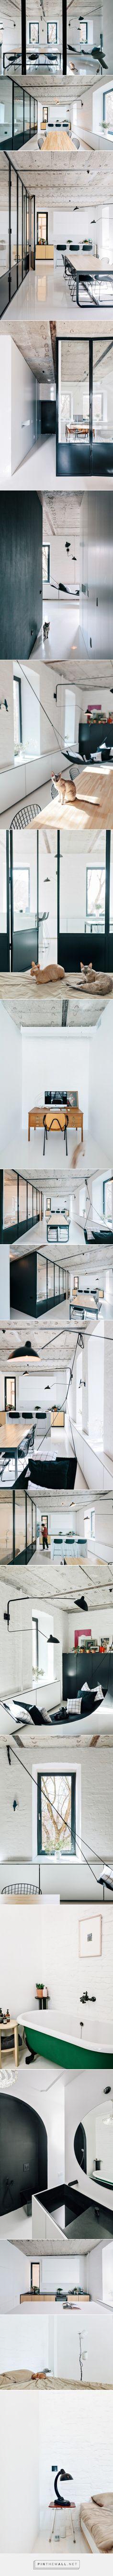 Apartment on Leningradsky Prospekt par Crosby Studios - Journal du Design... - a grouped images picture - Pin Them All